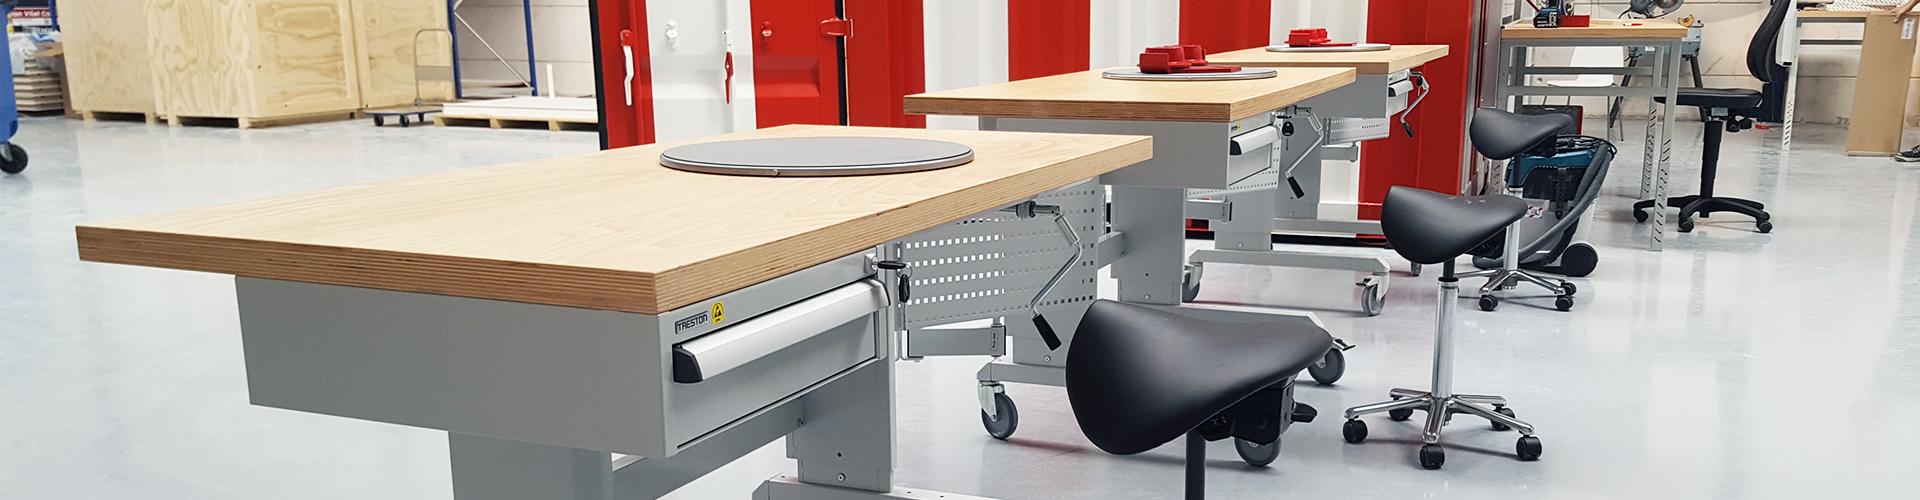 Sovella Nederland Treston assemblage werktafel met handmatige verstelling en multiplex tafelblad